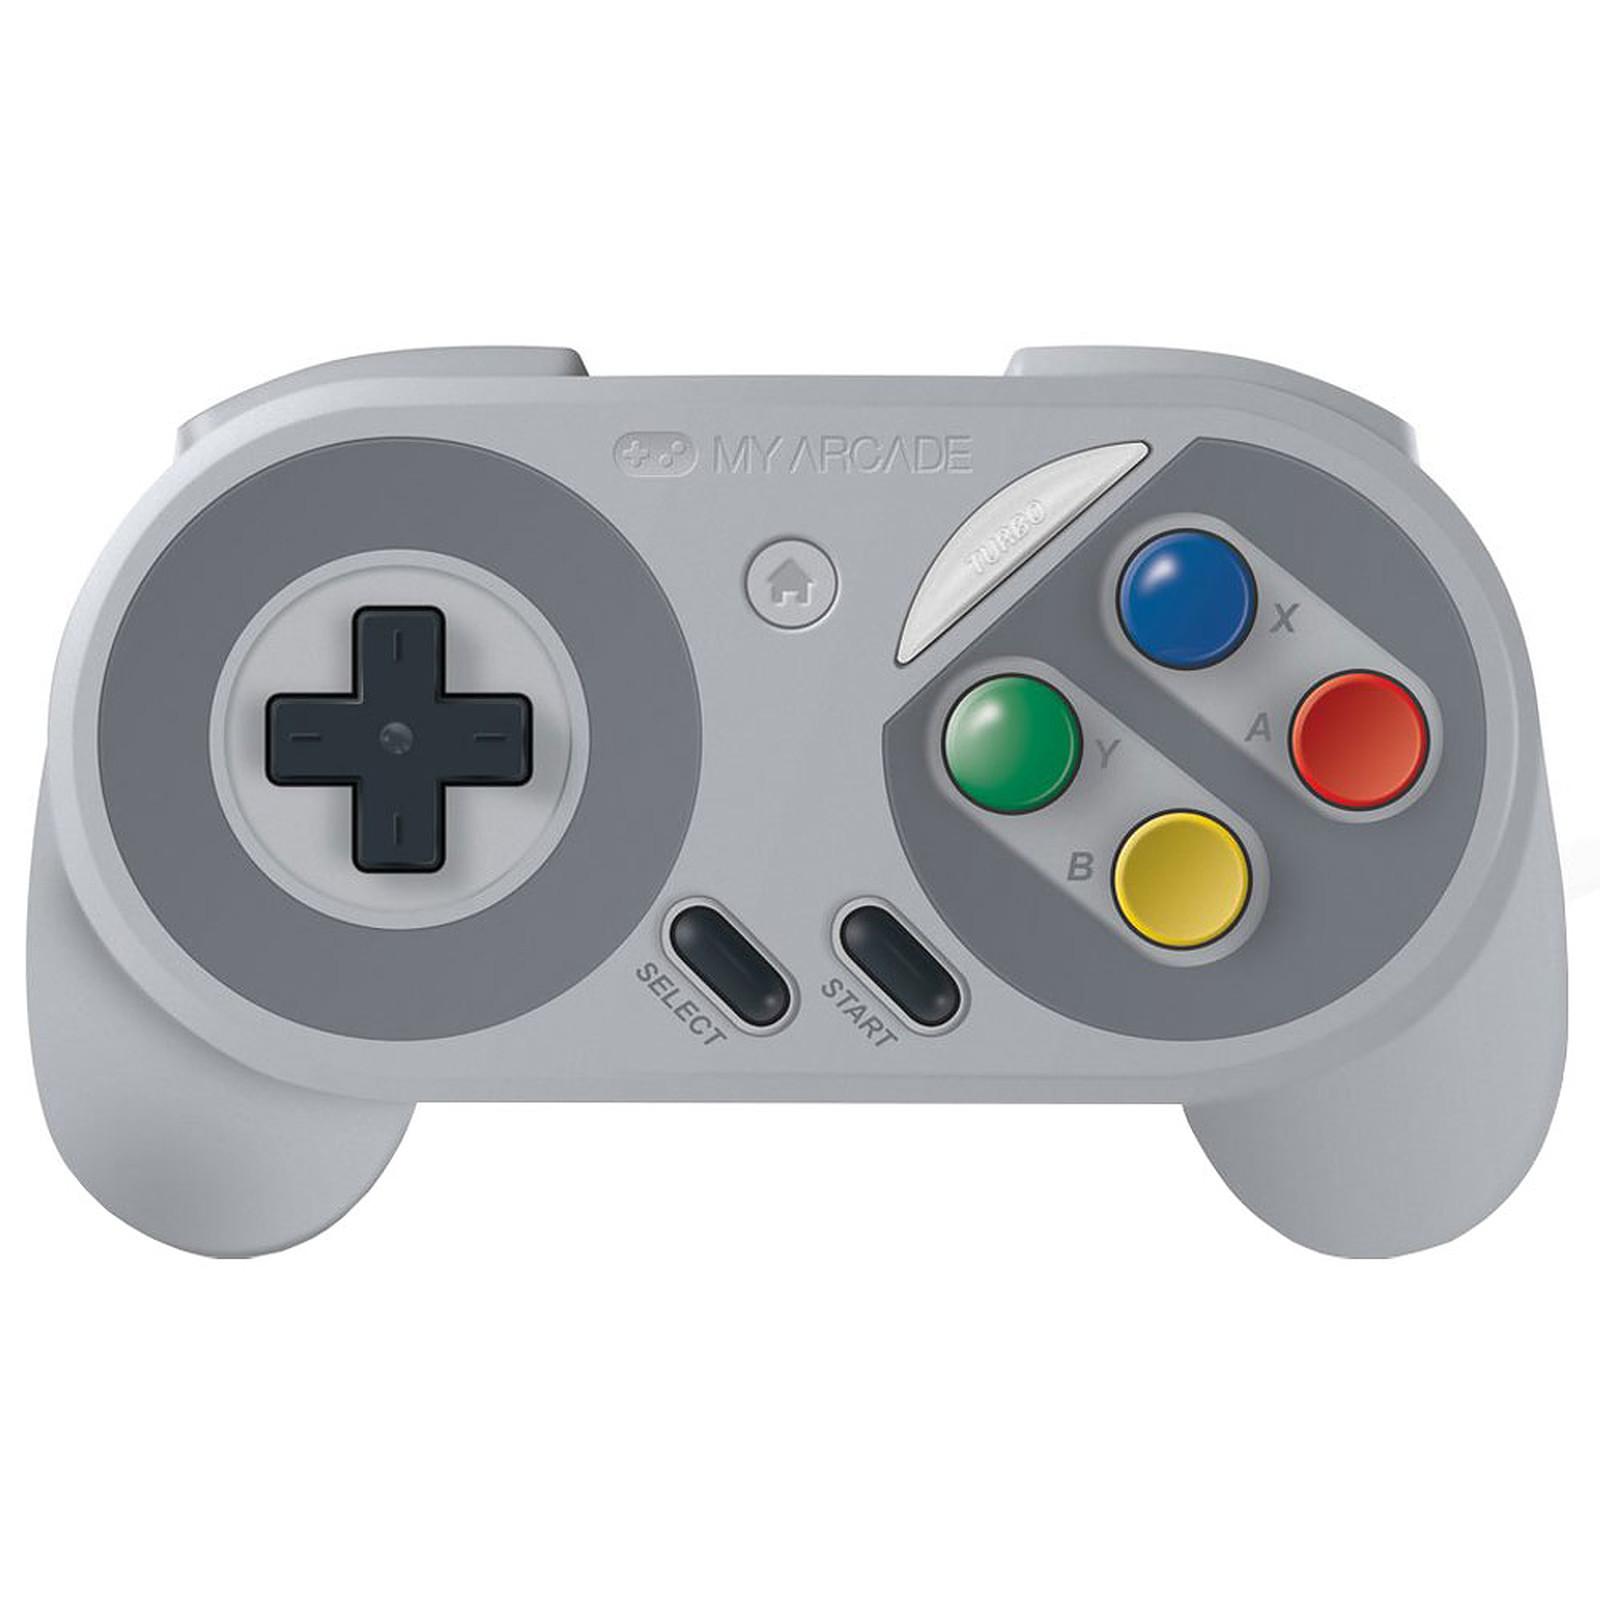 My Arcade Super Gamepad (Famicom Edition)